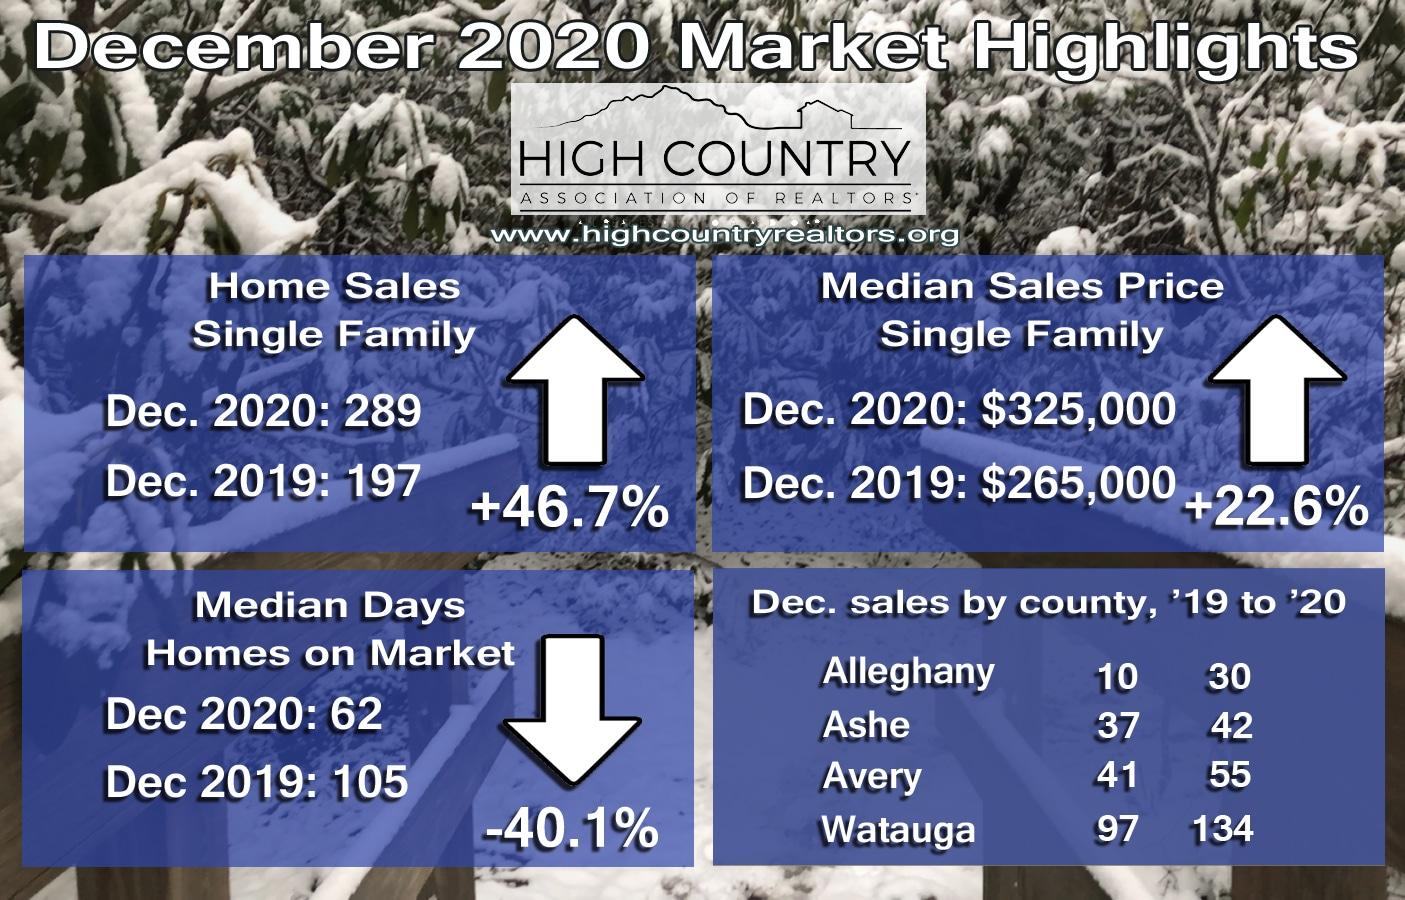 2020 home sales set new record